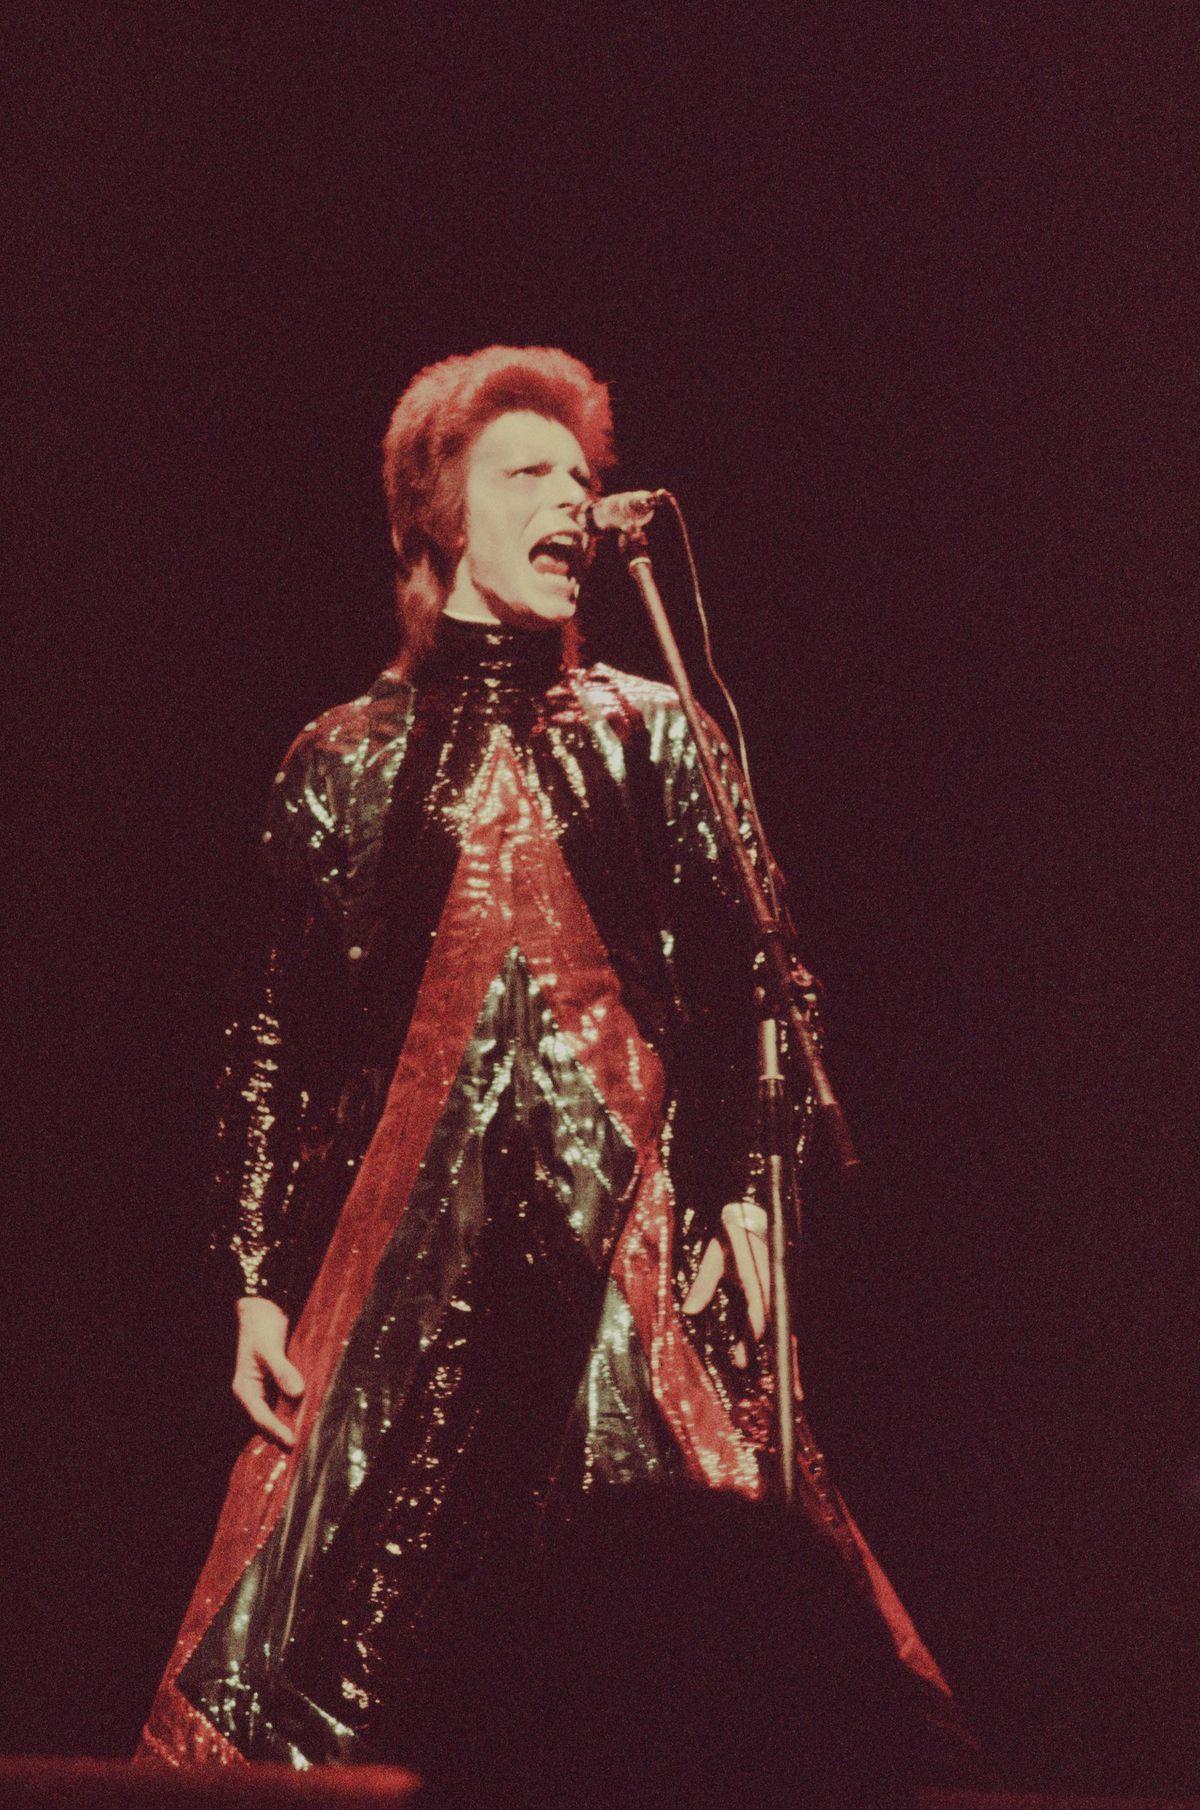 Pin by C J  Madero on David Bowie   David bowie fashion, David bowie